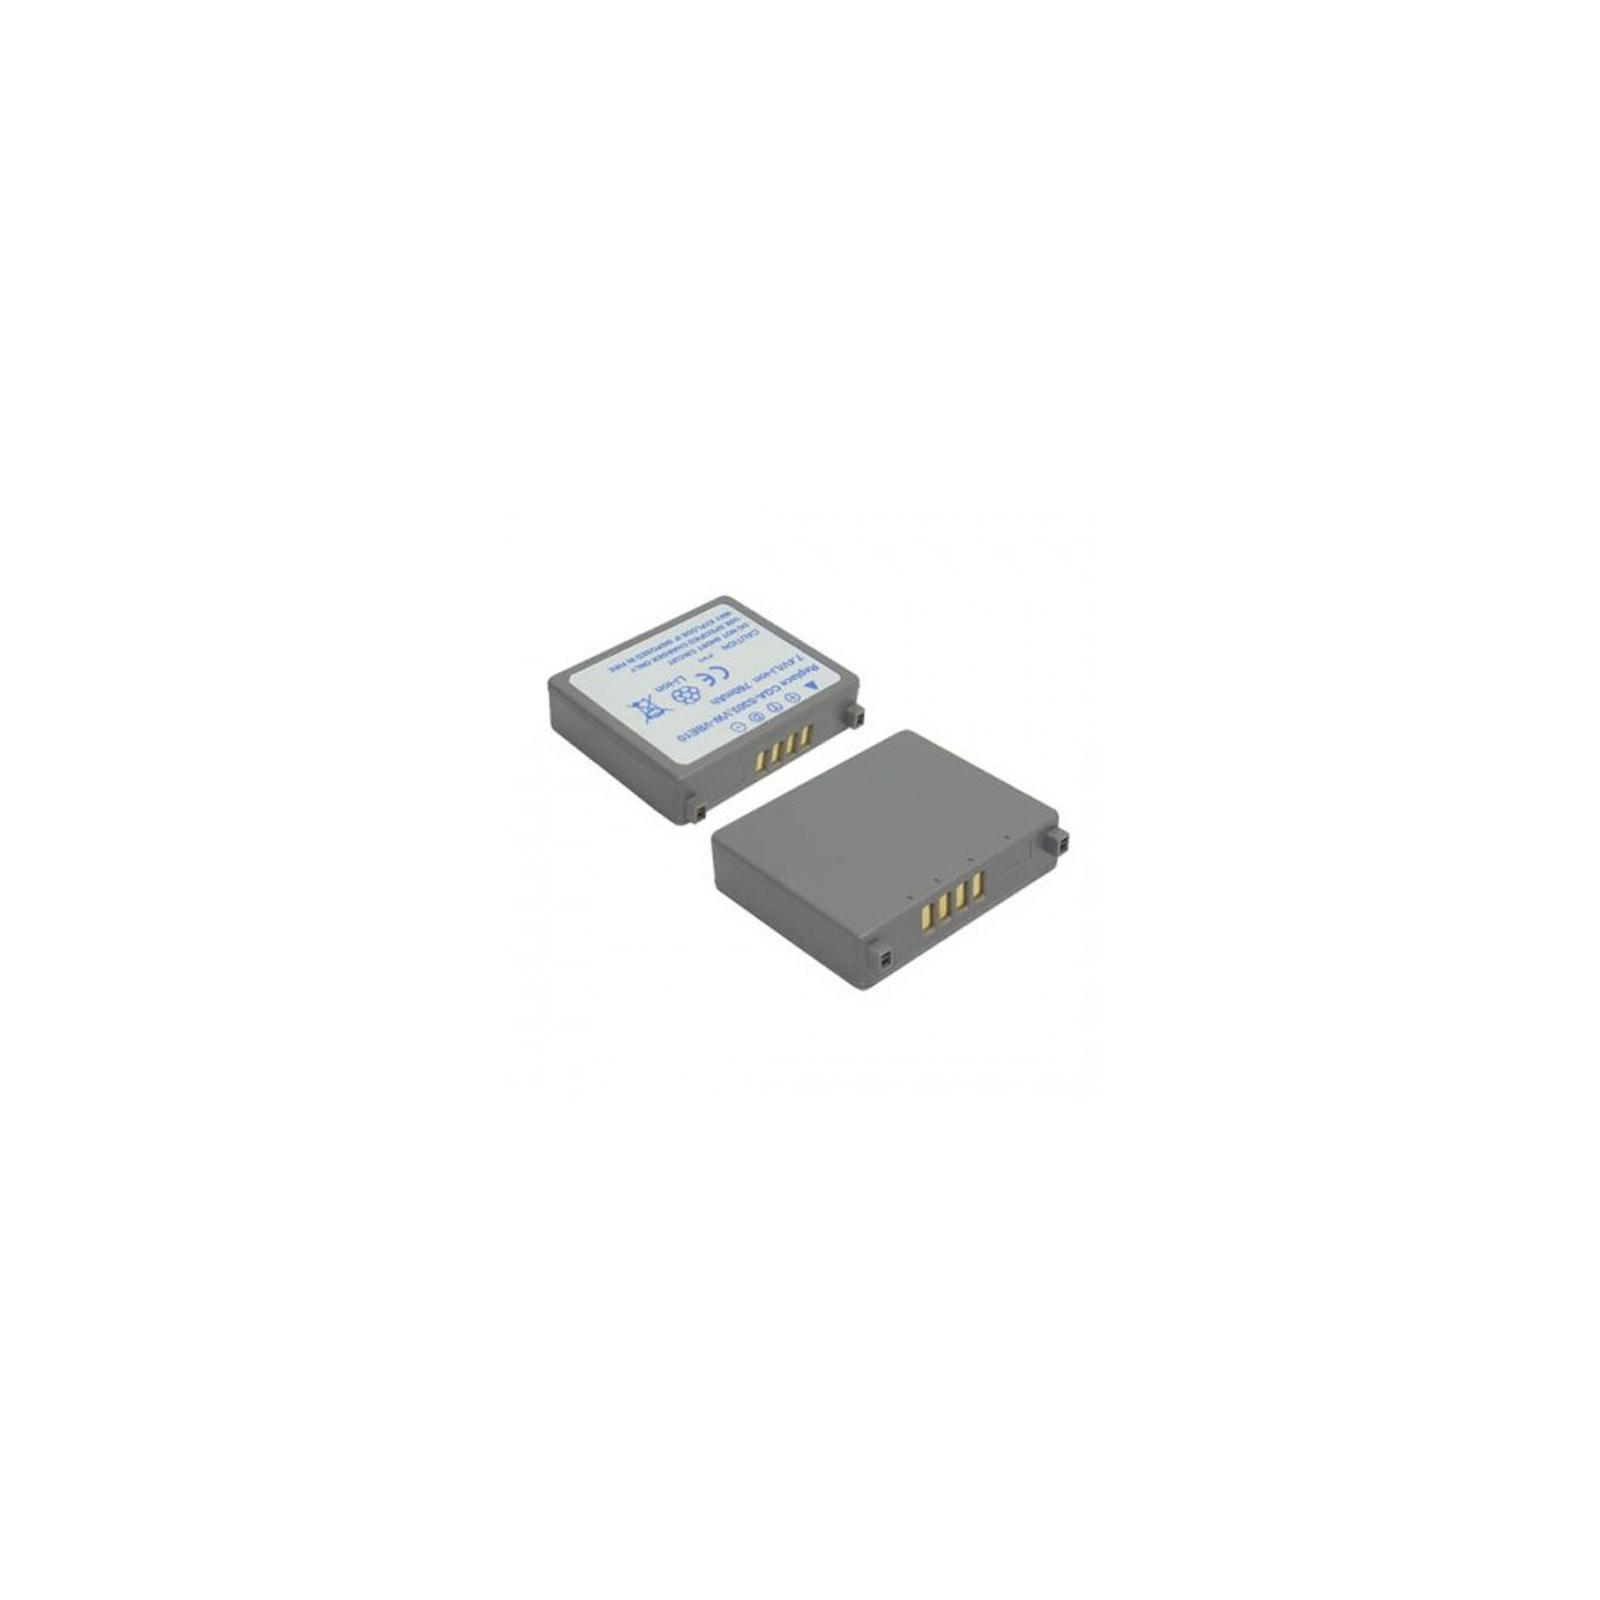 Аккумулятор к фото/видео EXTRADIGITAL Panasonic VW-VBE10, CGA-S303 (DV00DV1349)